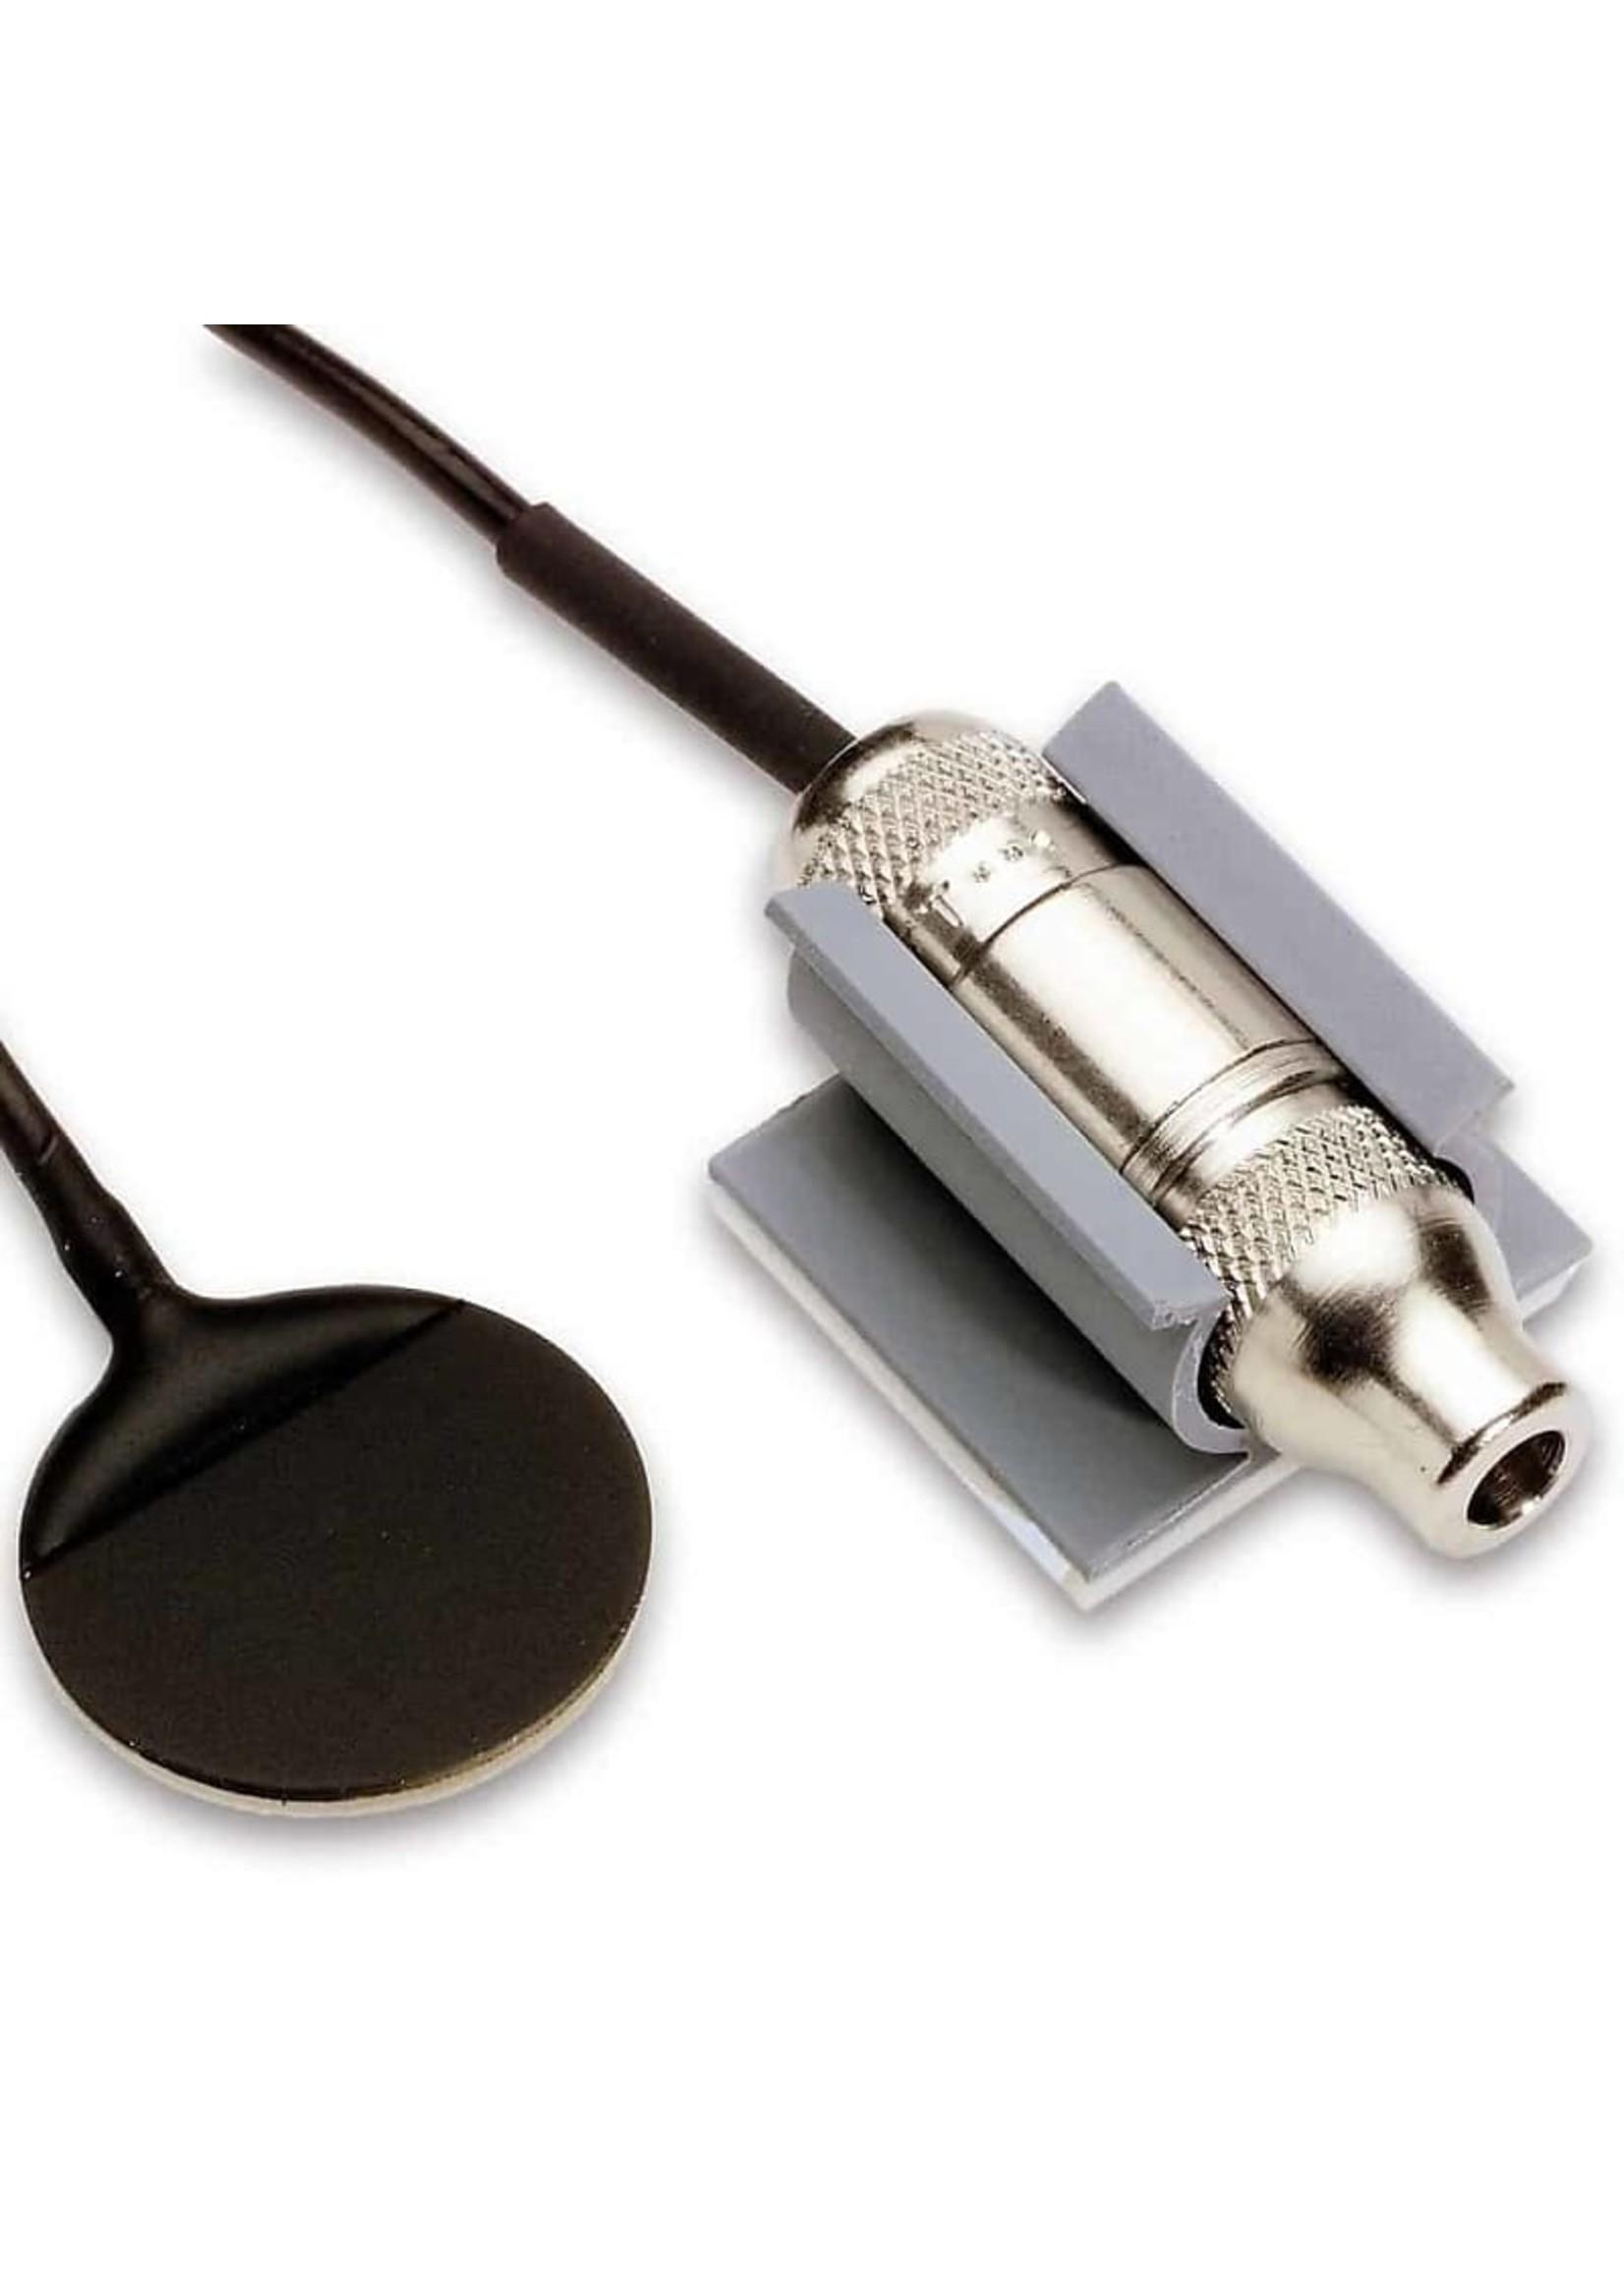 Fishman Fishman PRO-SBT-CLA Soundboard Transducer